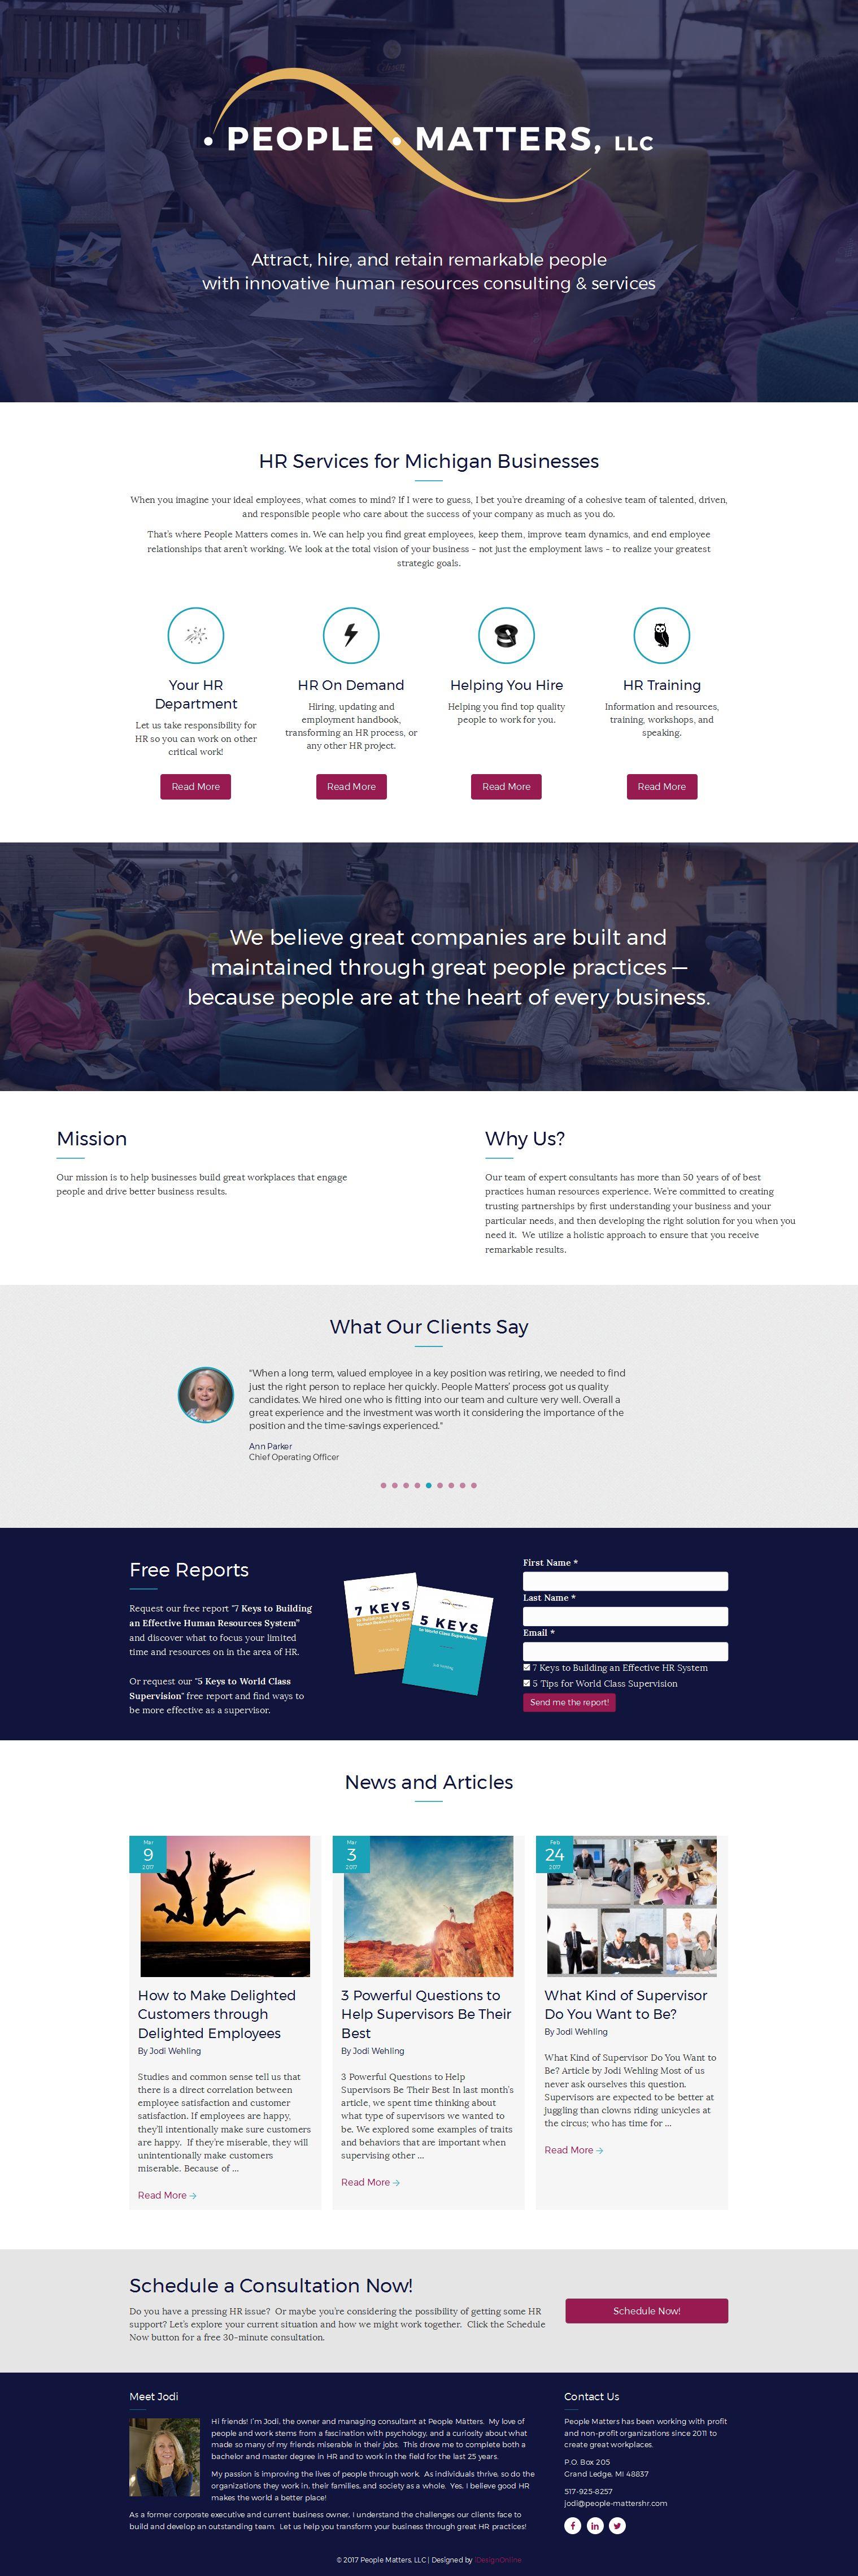 People Matters Website